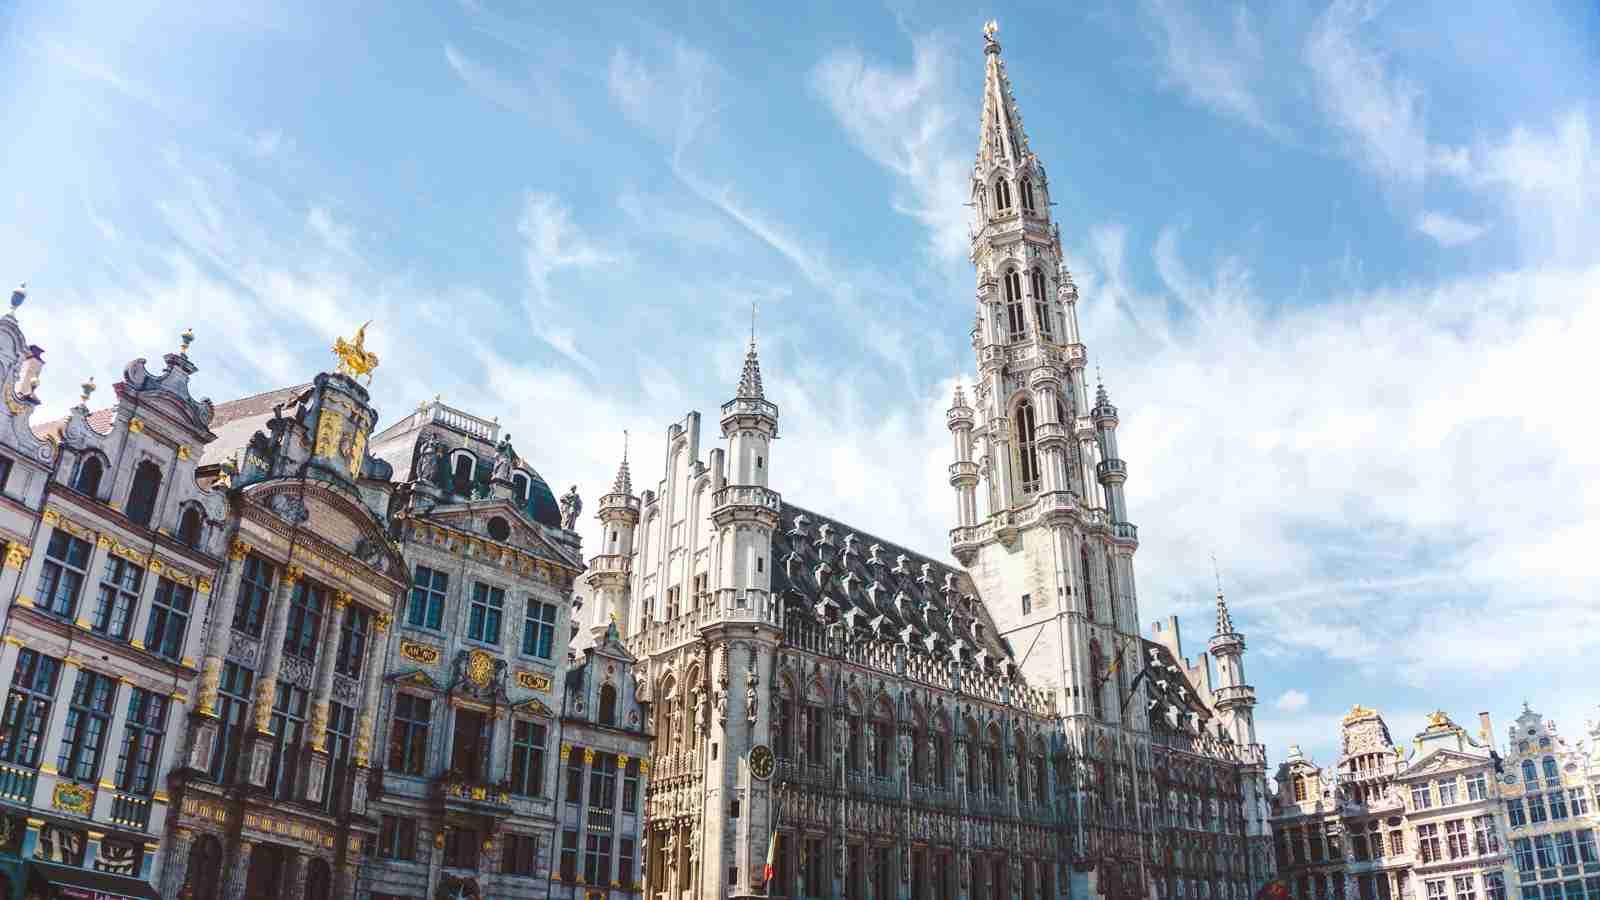 Brussels, Belgium. (Photo by Yeo Khee / Unsplash)